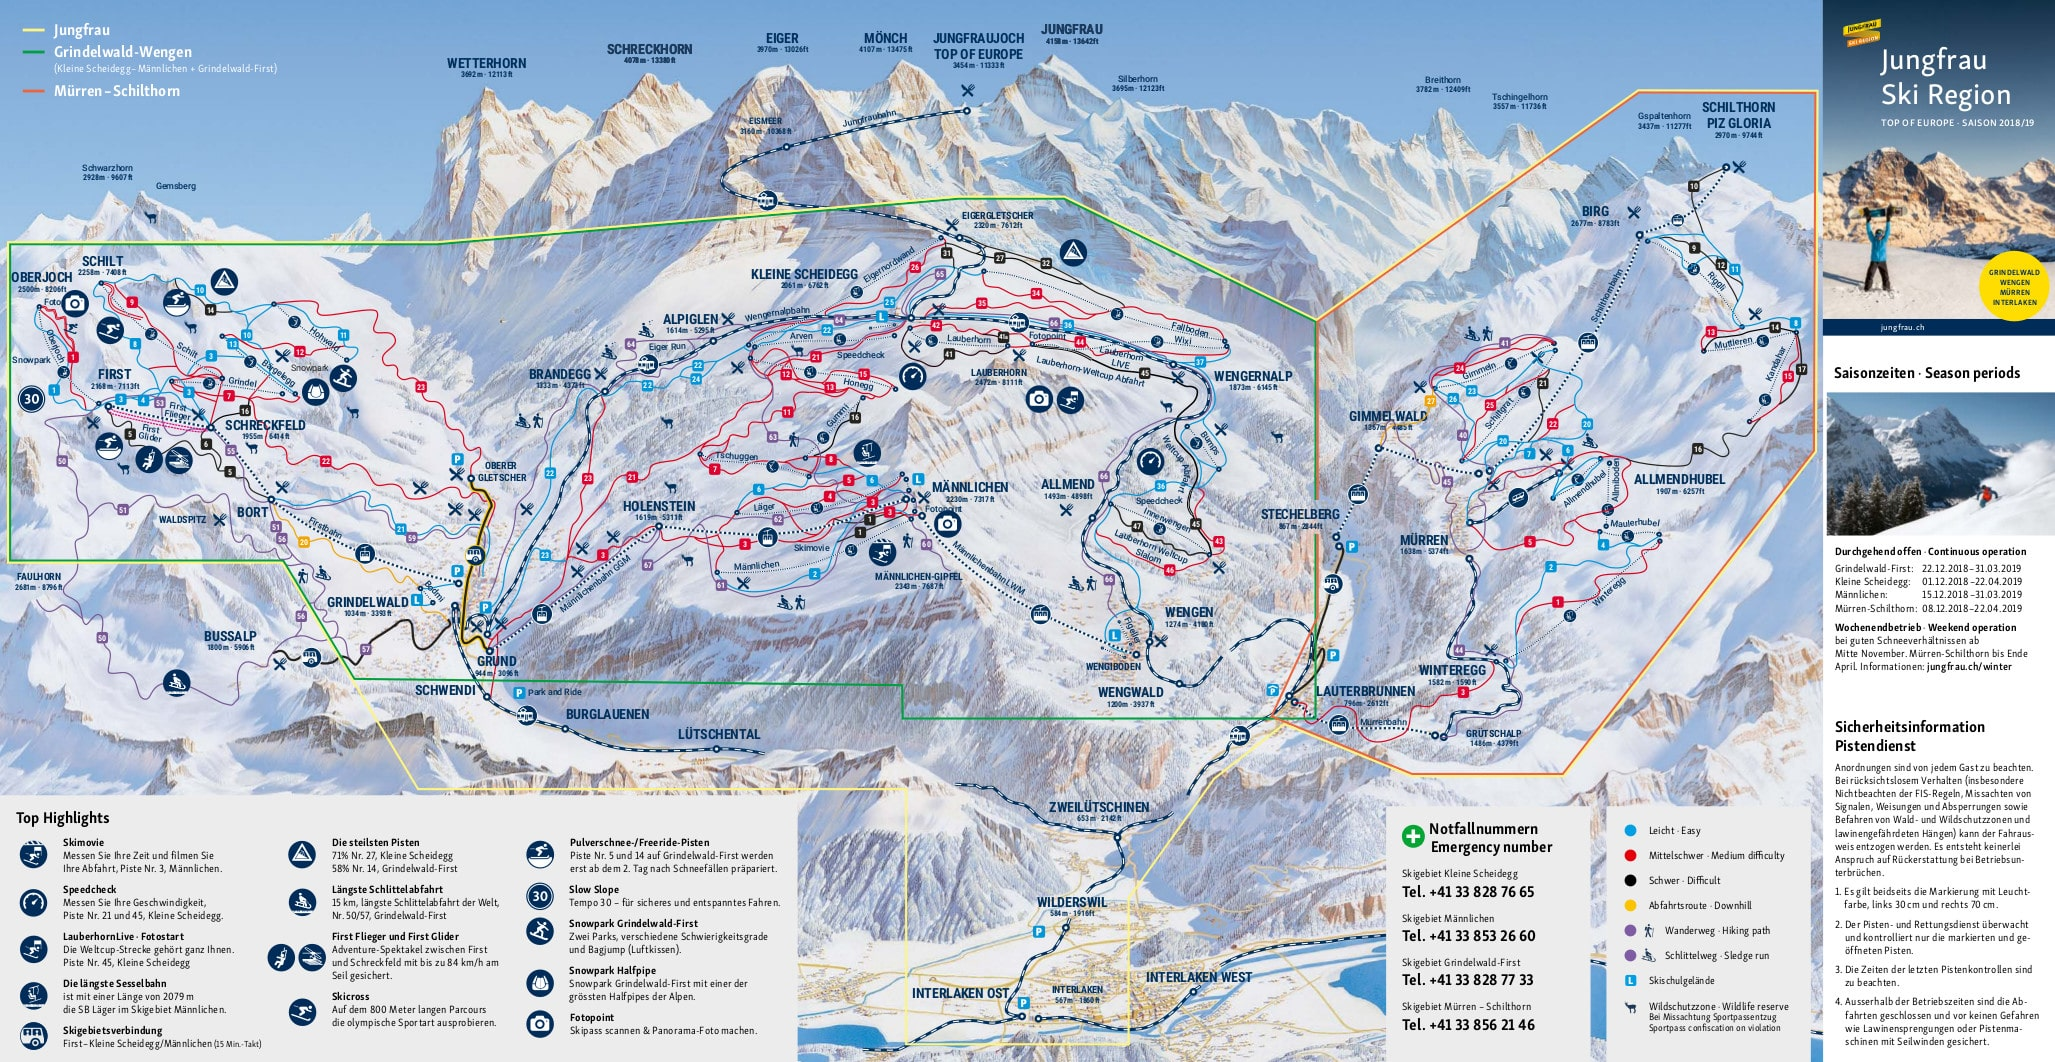 Grindelwald i okolice - mapa regionu zimą